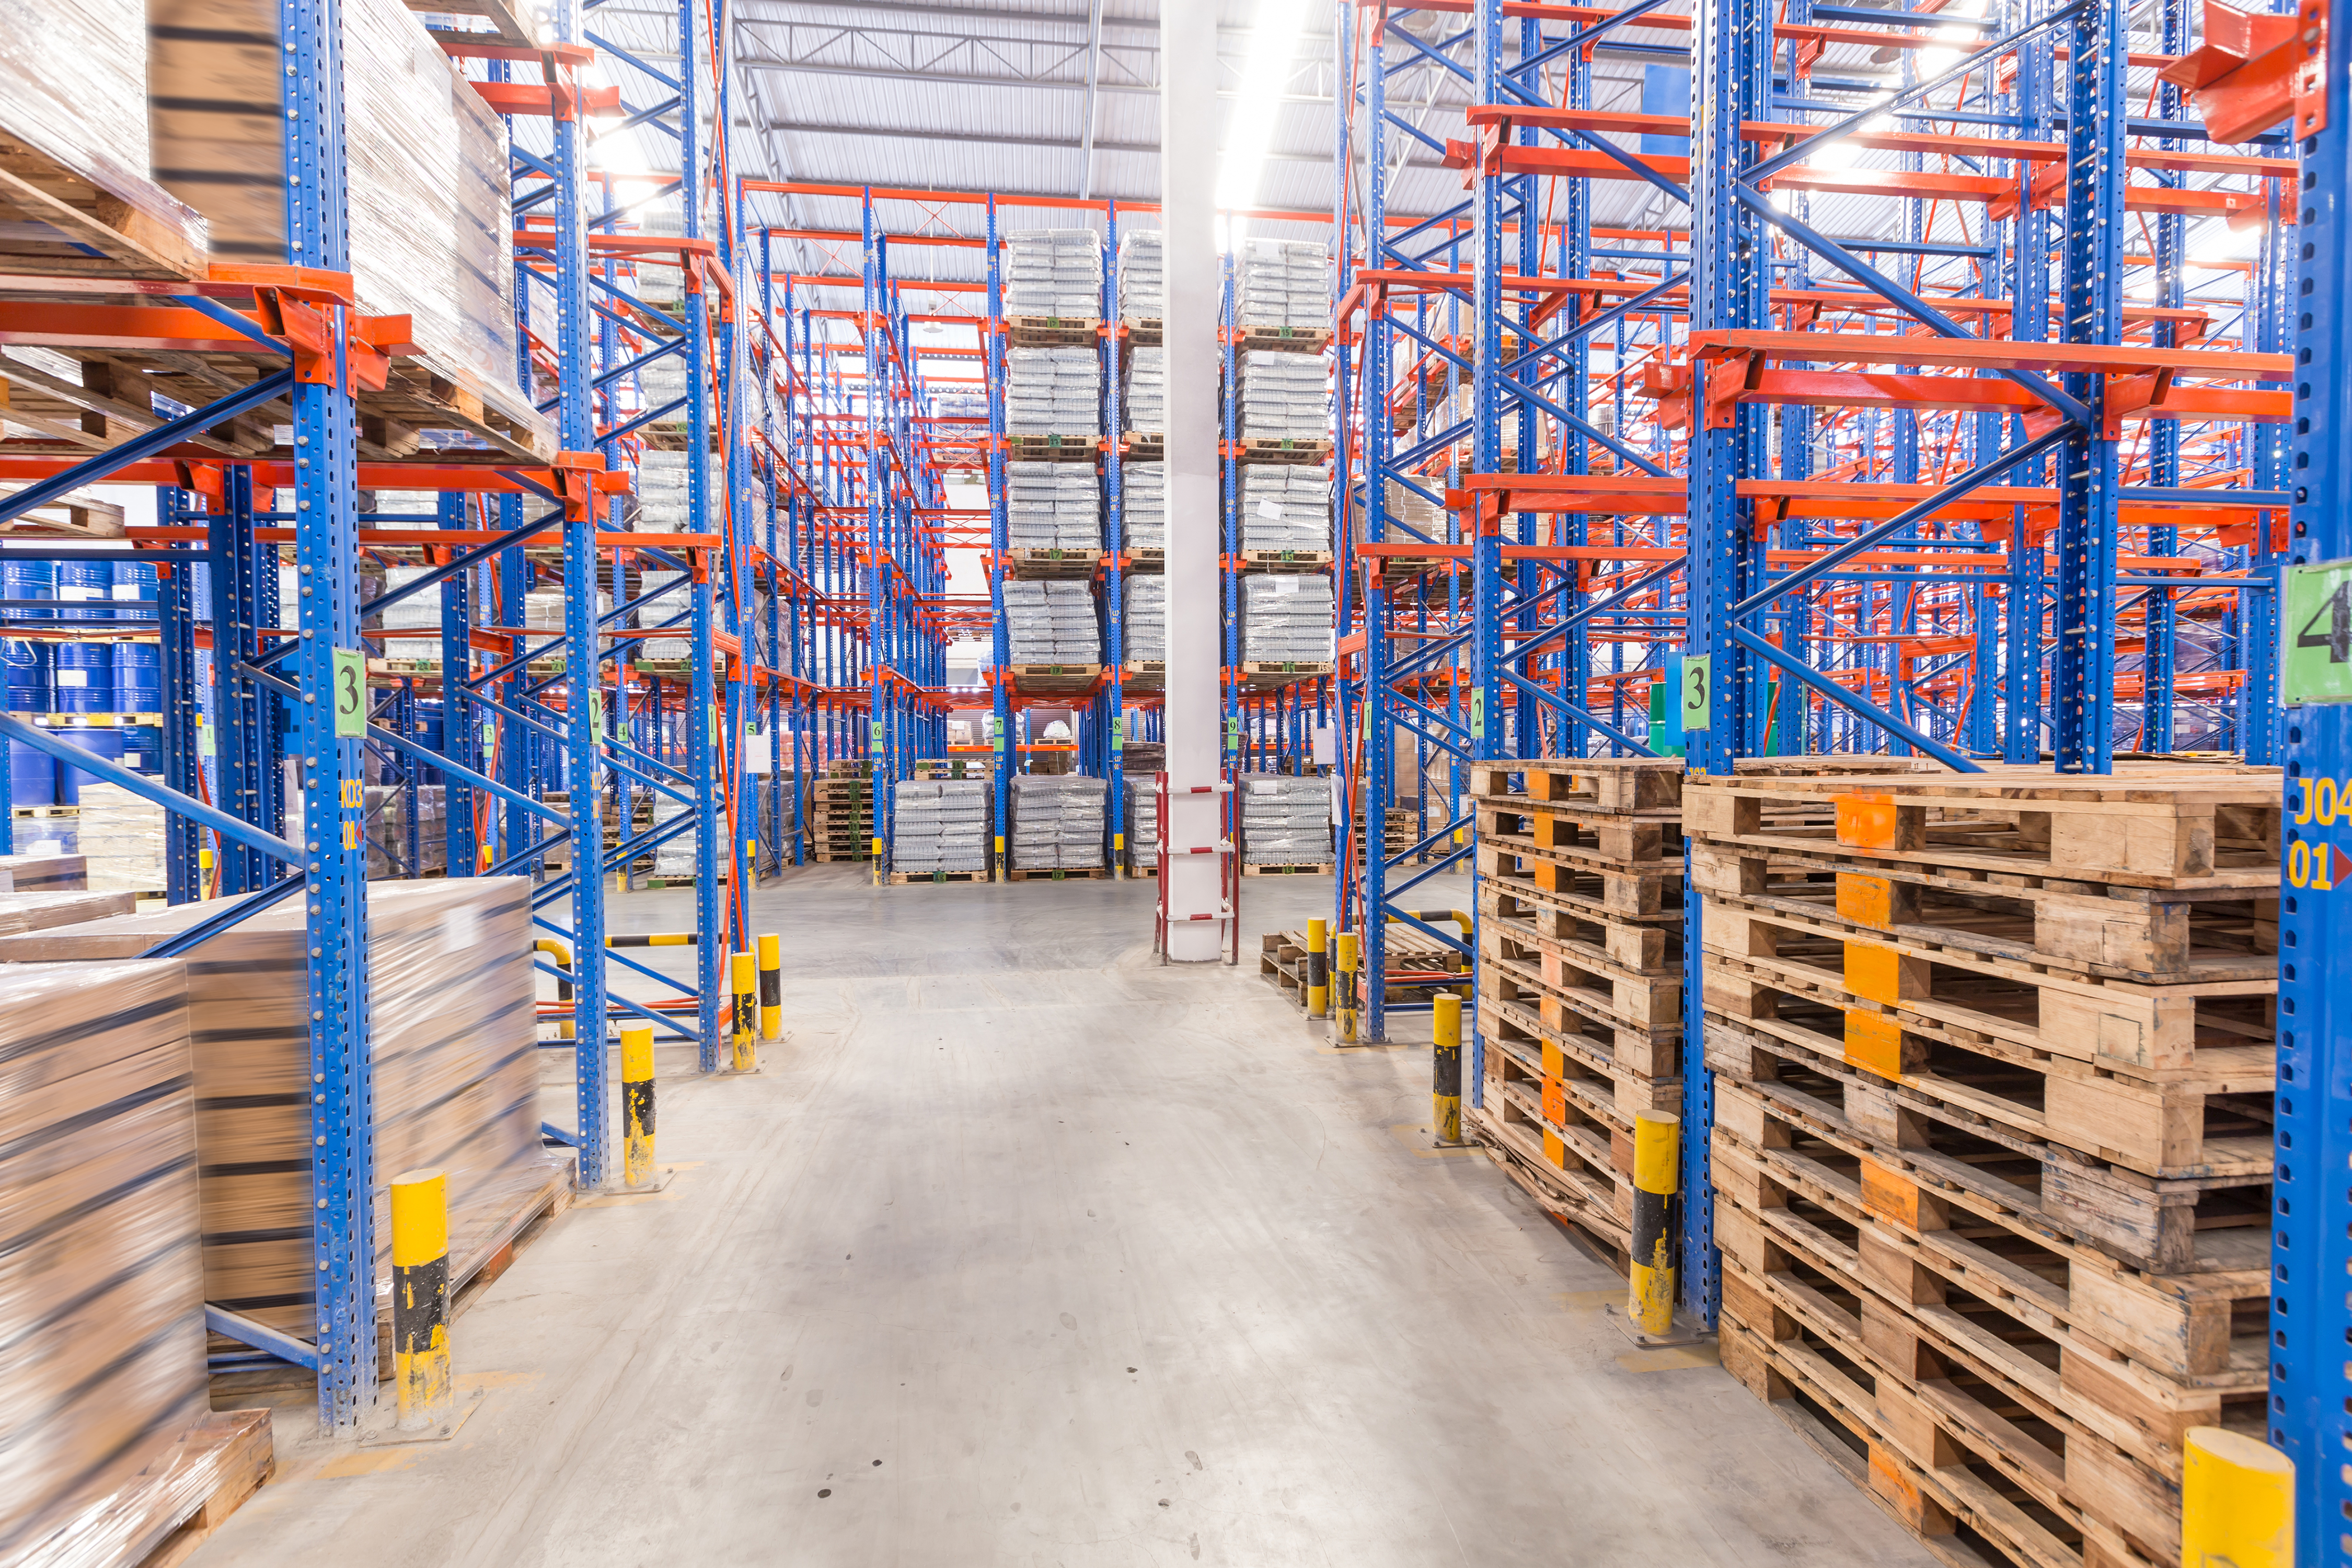 Warehouse Shelving | Pallet Racking